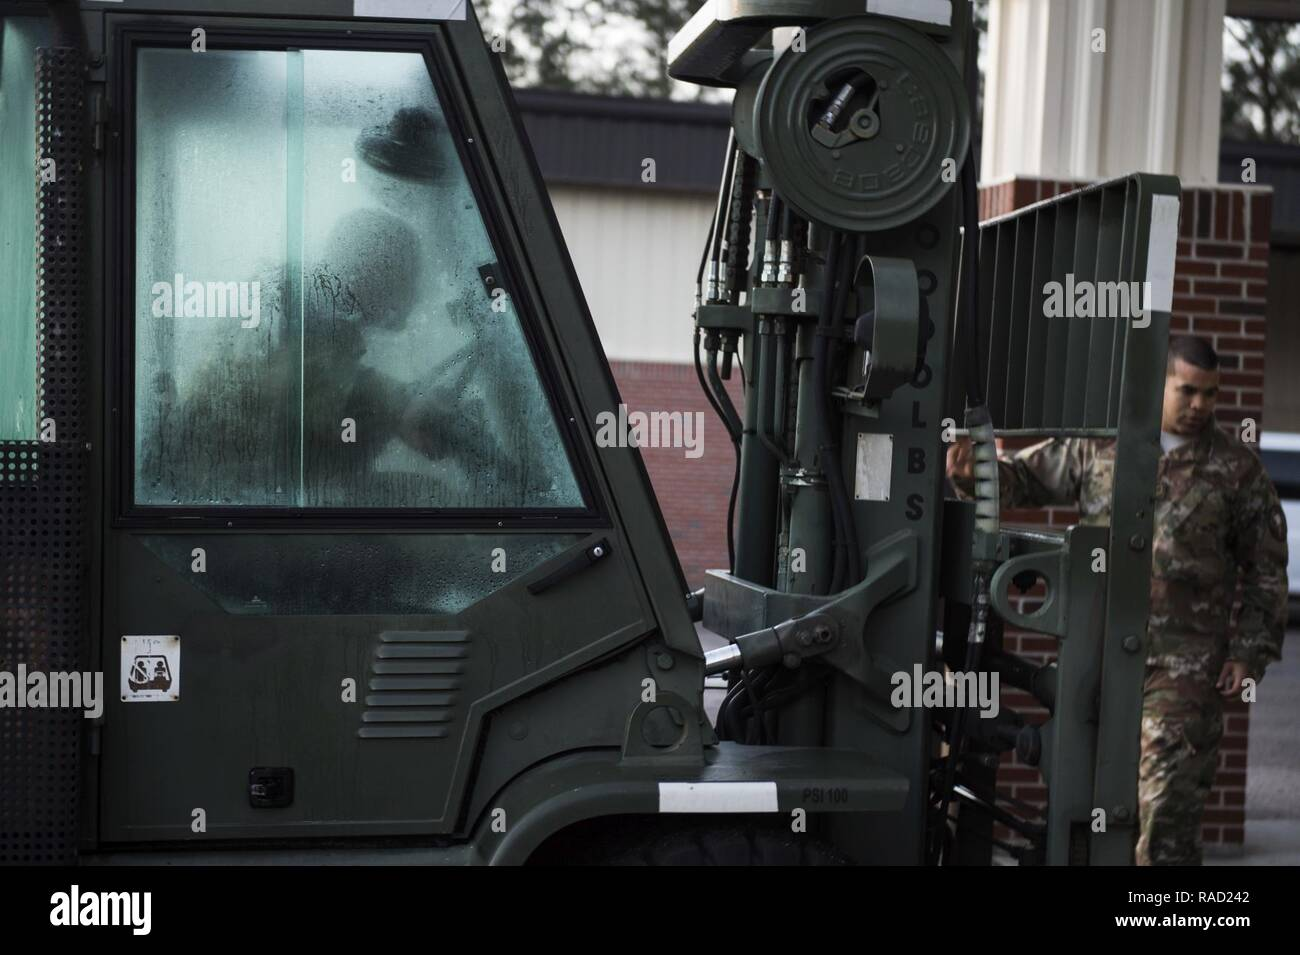 Joint Combat Camera Afghanistan Stock Photos & Joint Combat Camera